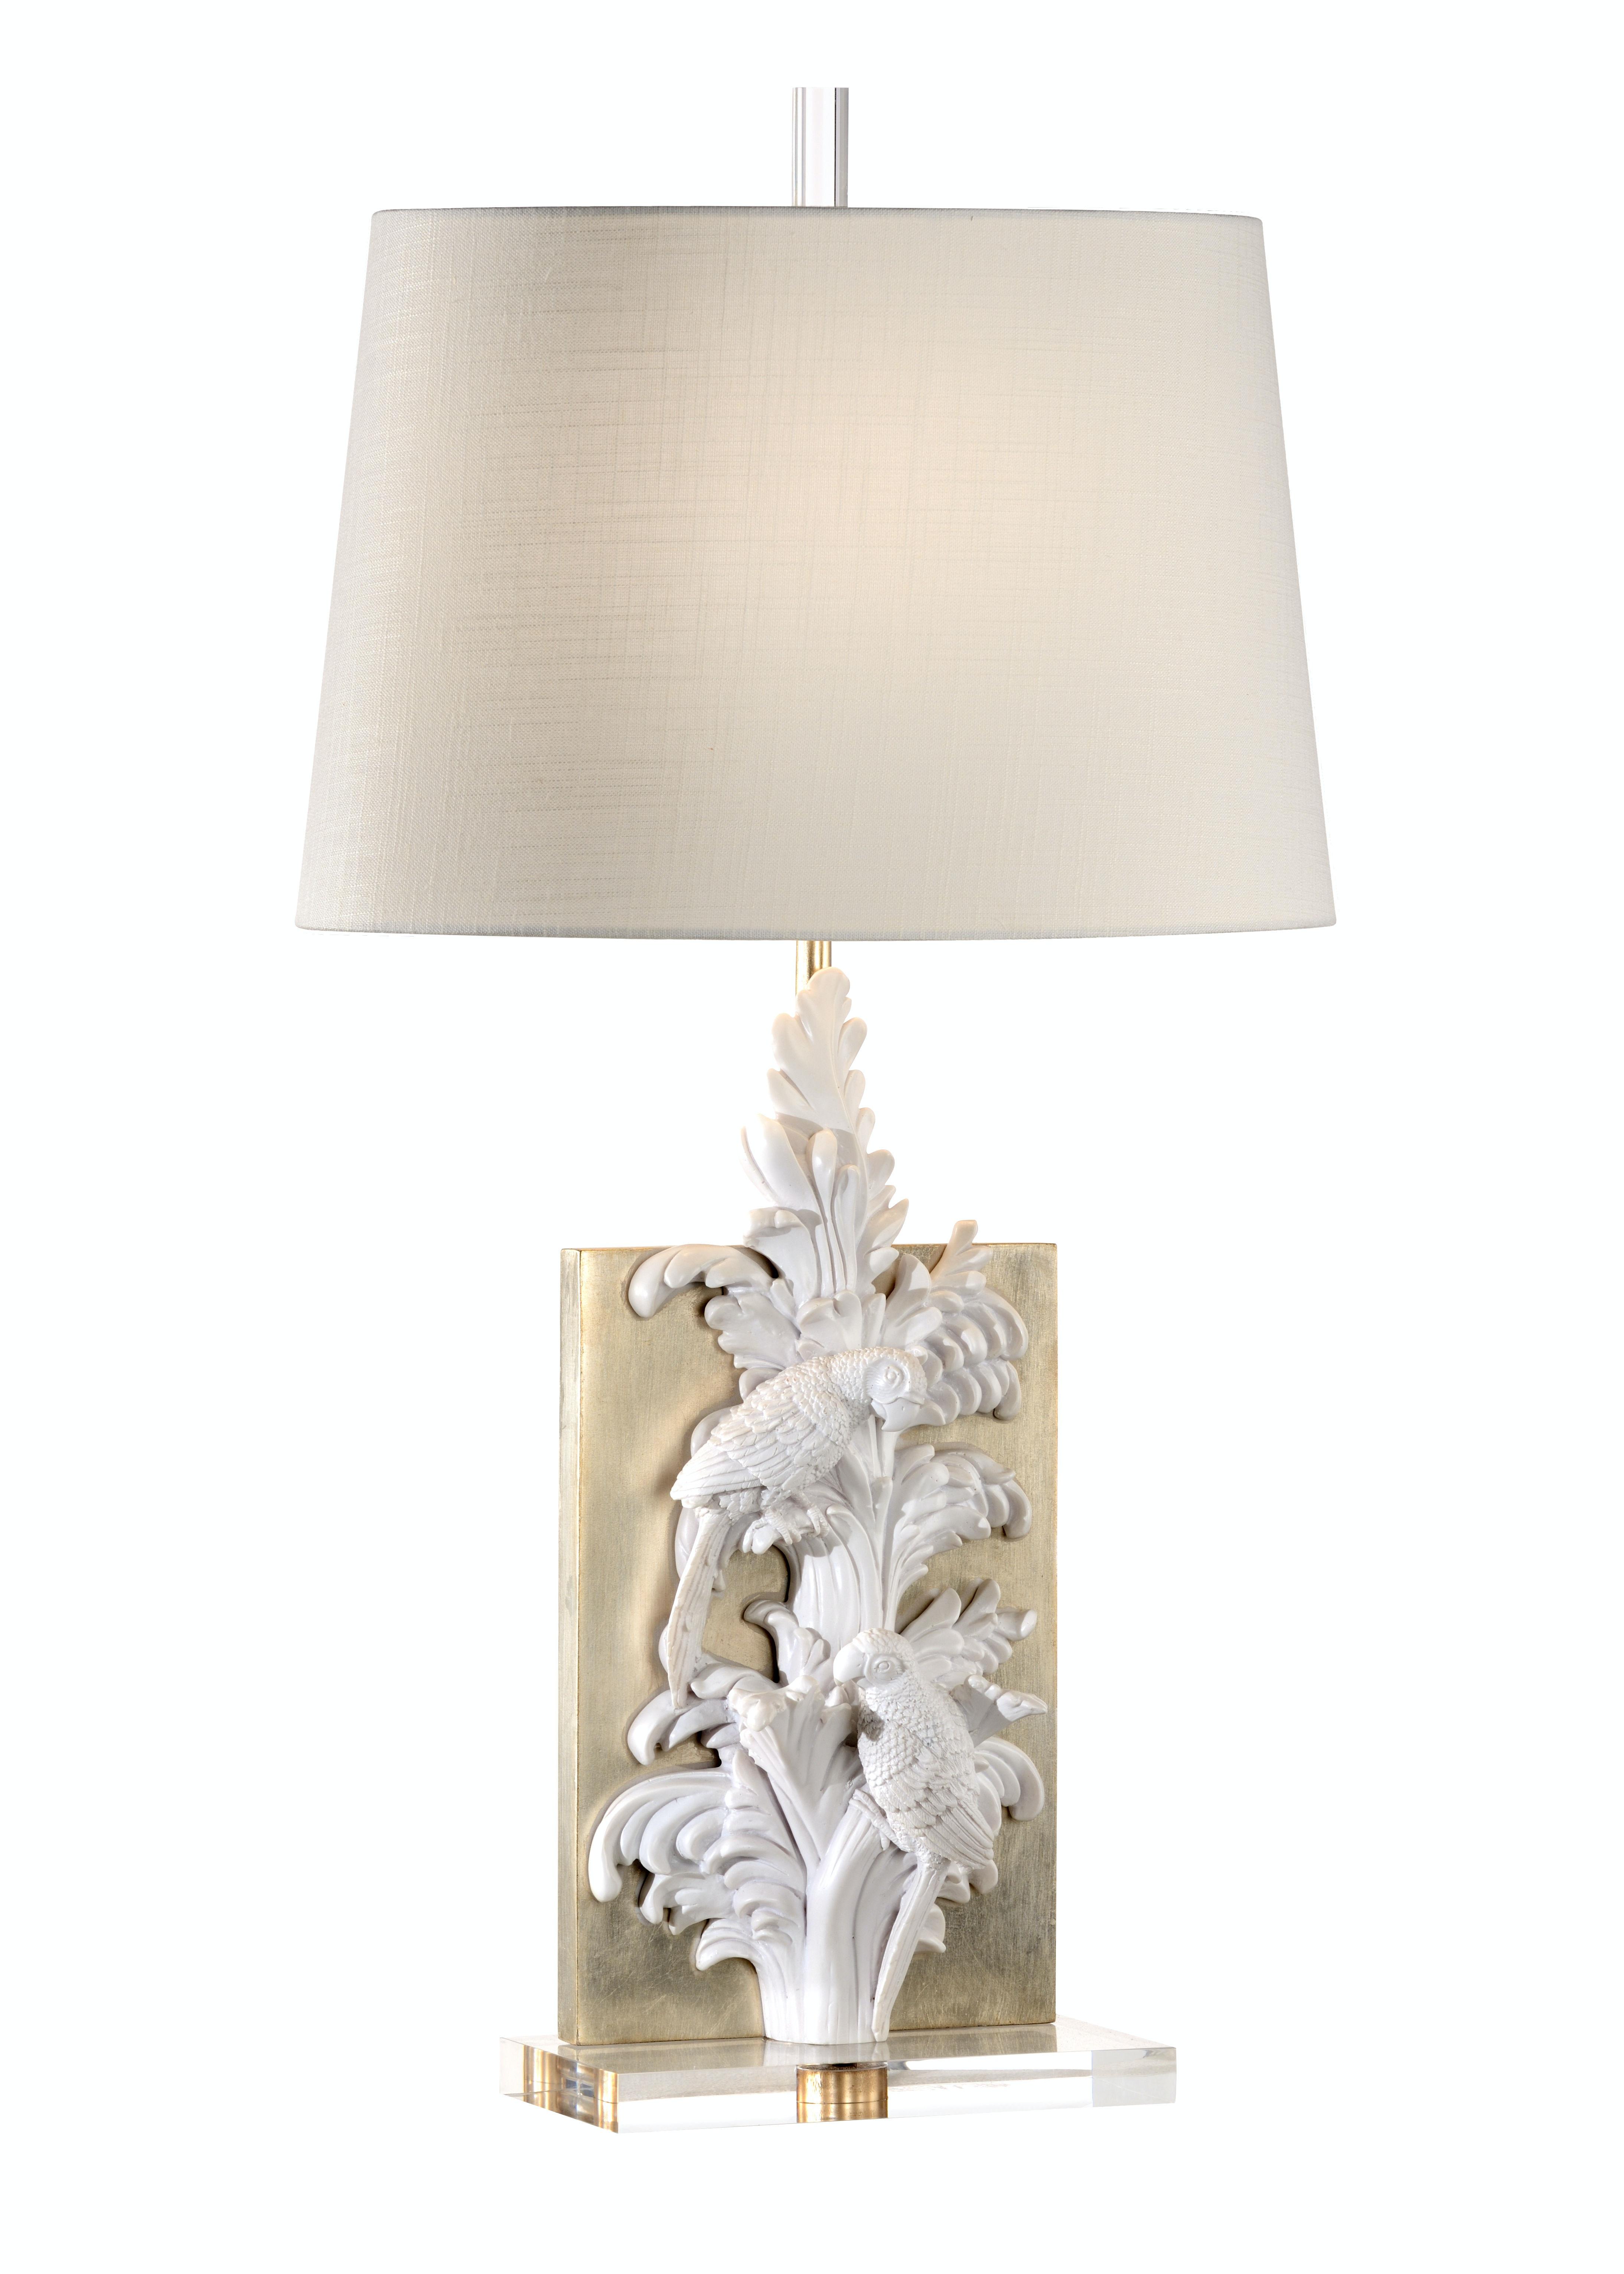 Brand new Wildwood Lamps Furniture - Greenbaum Interiors - Montclair, Wayne  ZG19